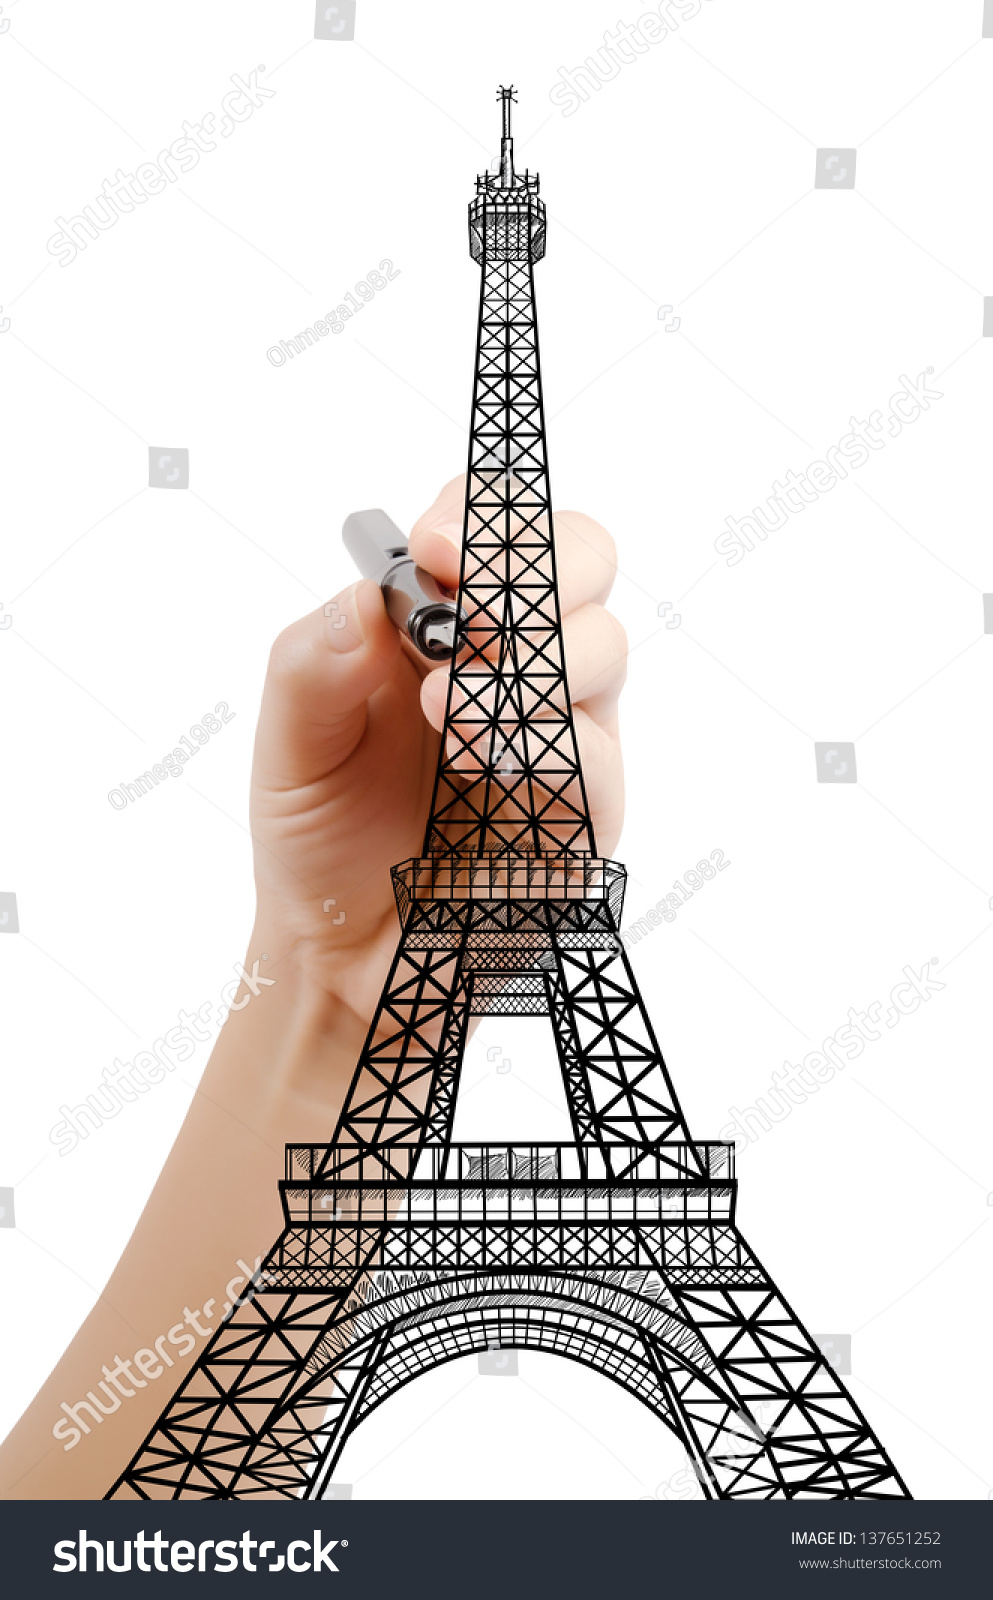 Line Drawing Eiffel Tower : Hand drawing eiffel tower line paris stock illustration